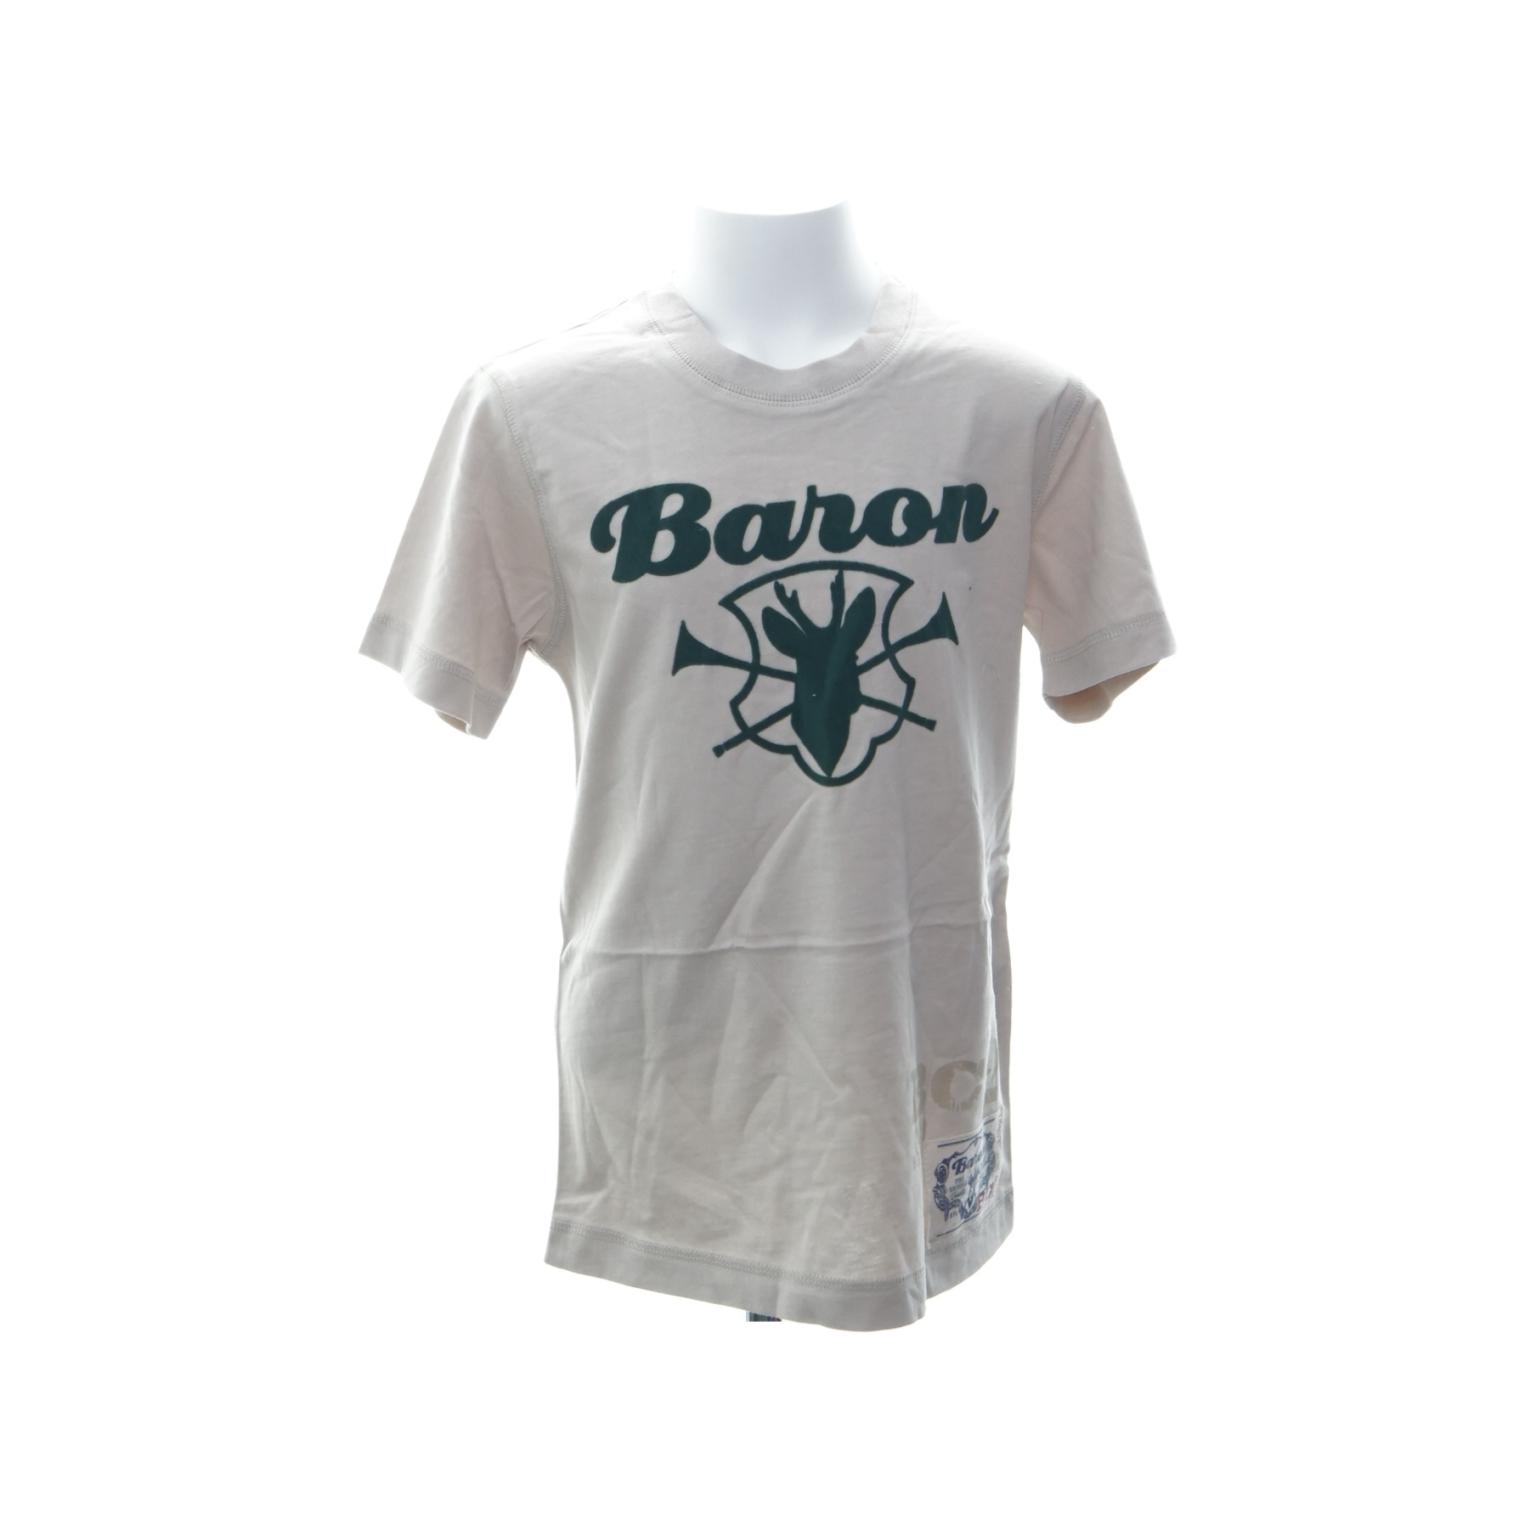 T-shirt (Beige) från Baron  999bfe2a85a11